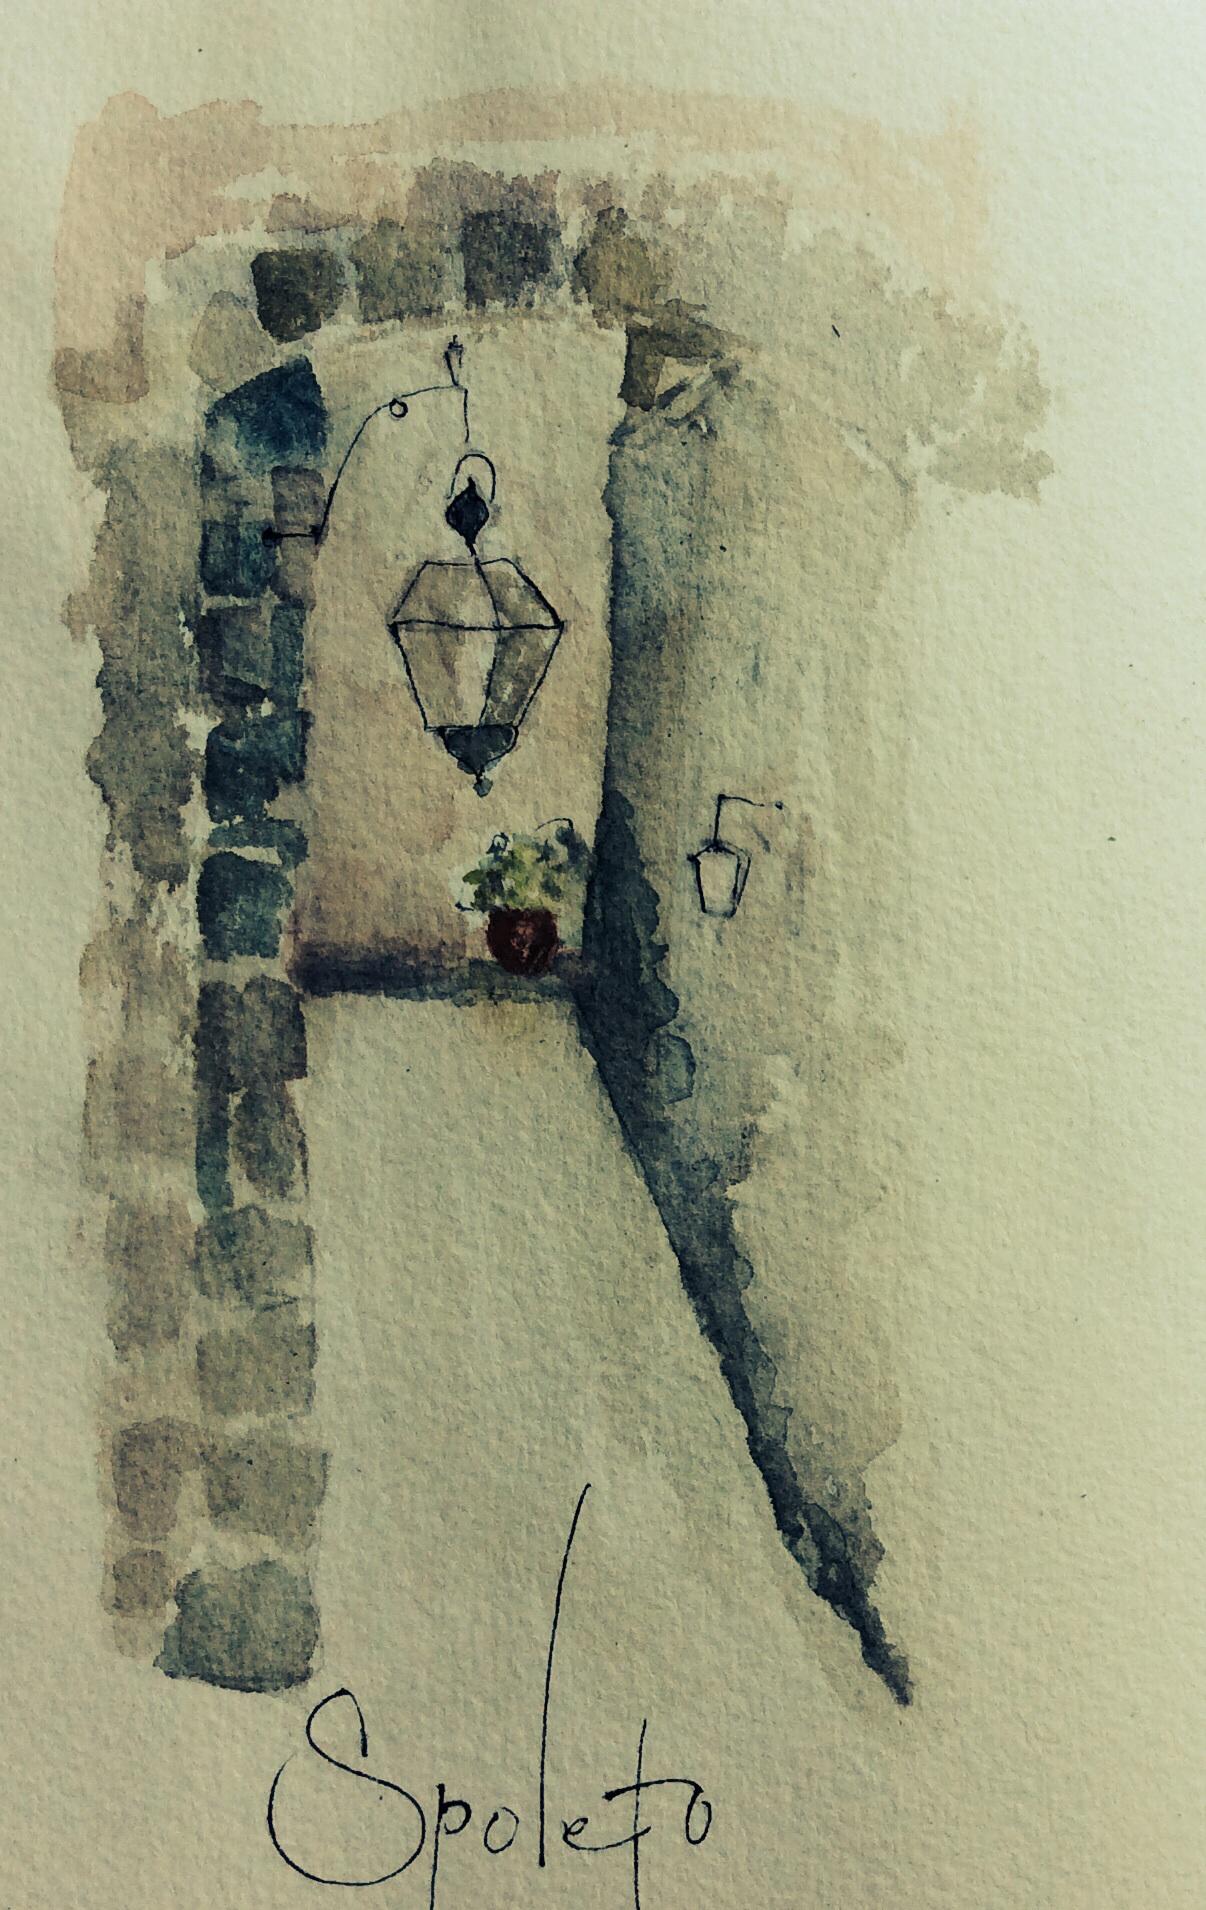 Pathway in Spoleto, L Doctor sketchbook